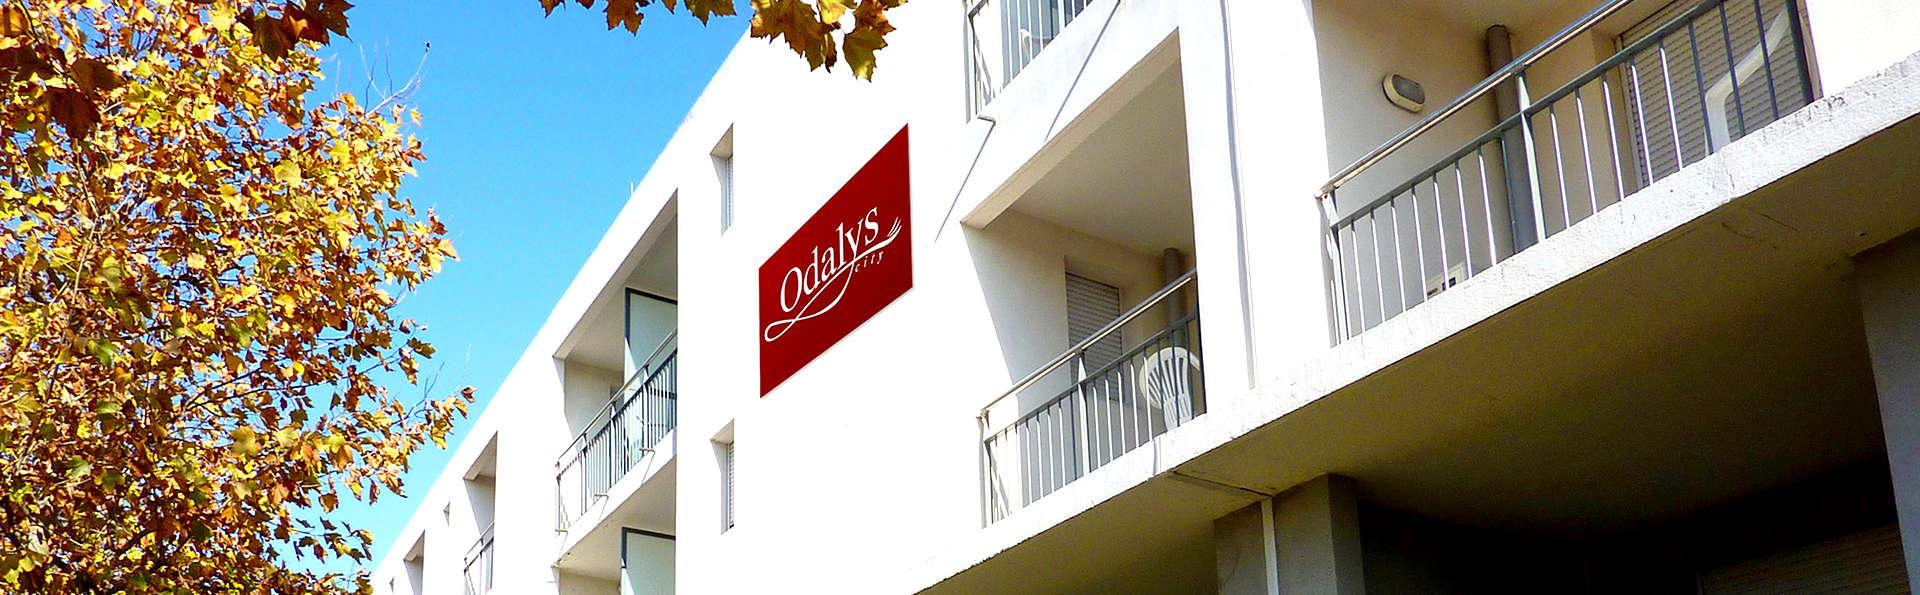 Appart'hôtel Odalys Aix Chartreuse - Edit_Front2.jpg